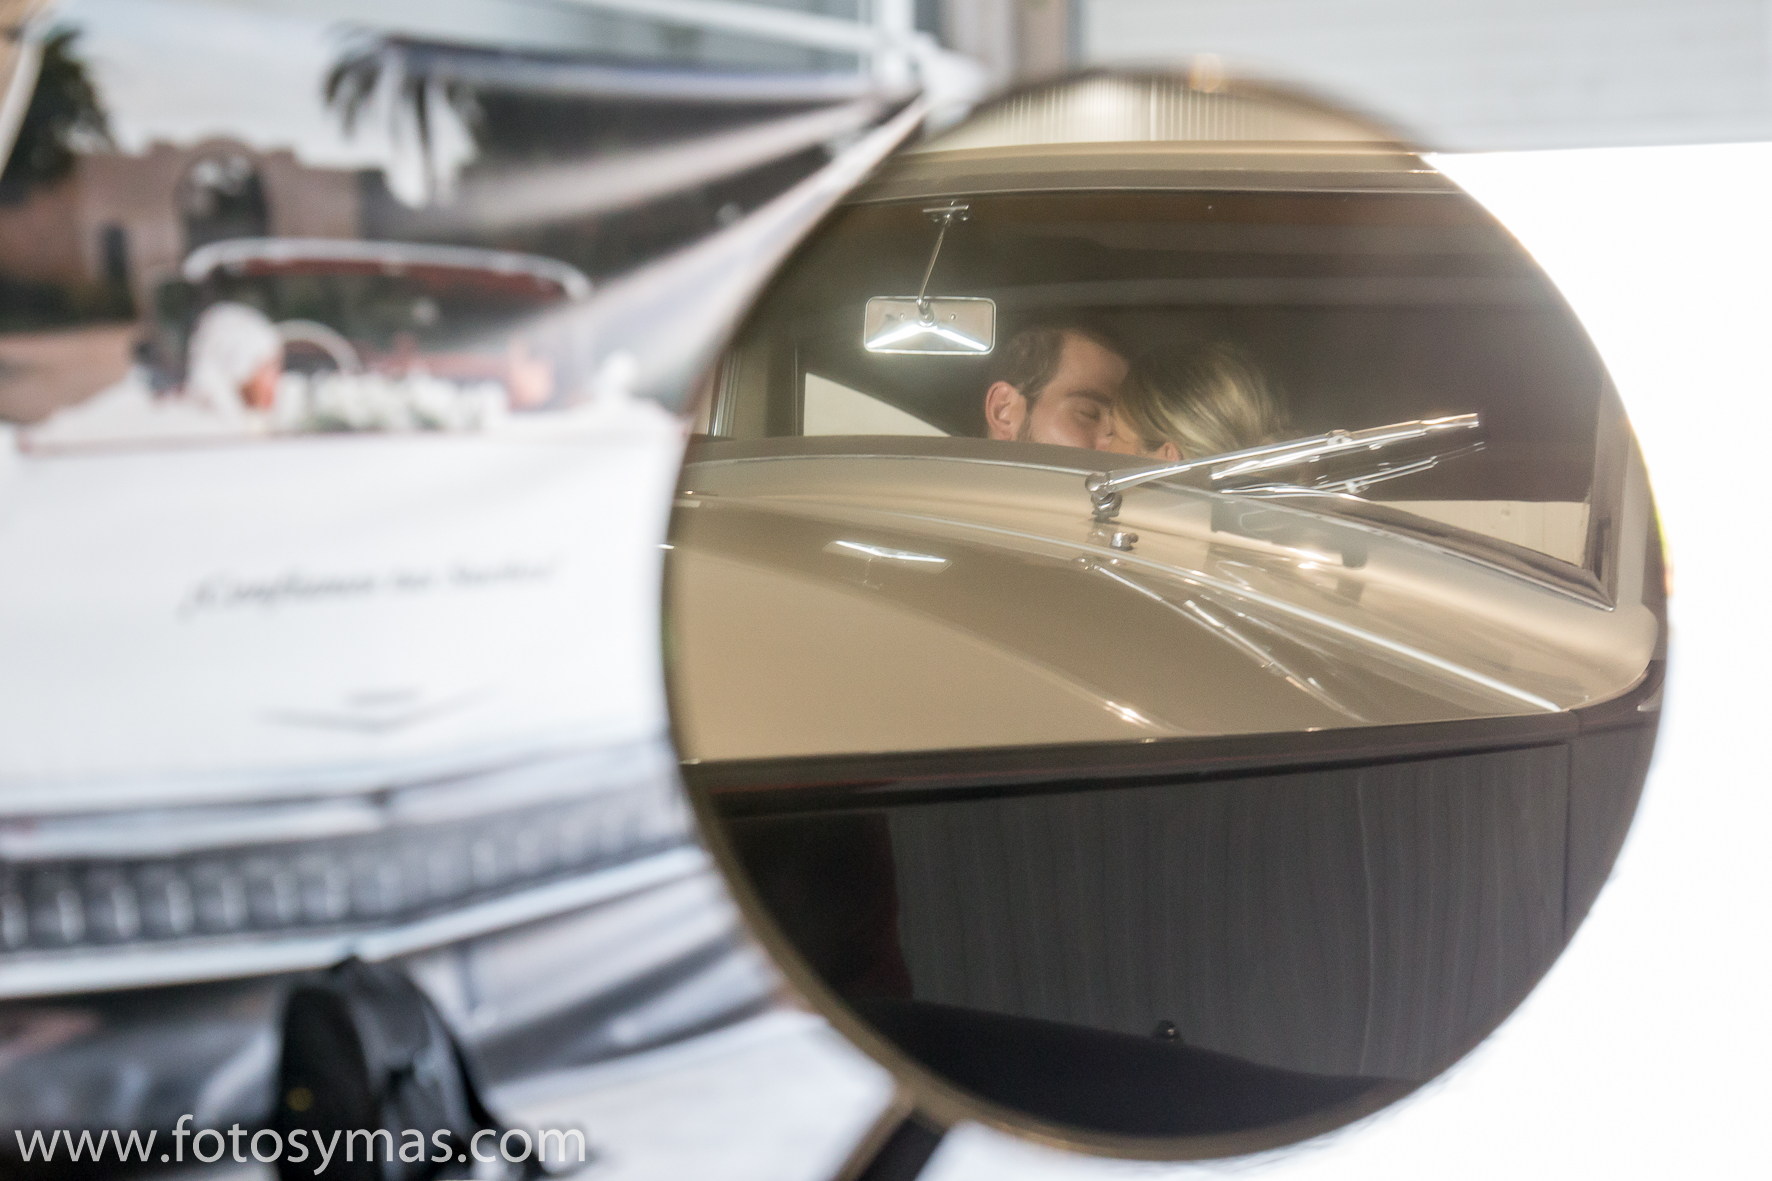 _MG_3570_RaquelMunoz_httq.fotosymas.com-2